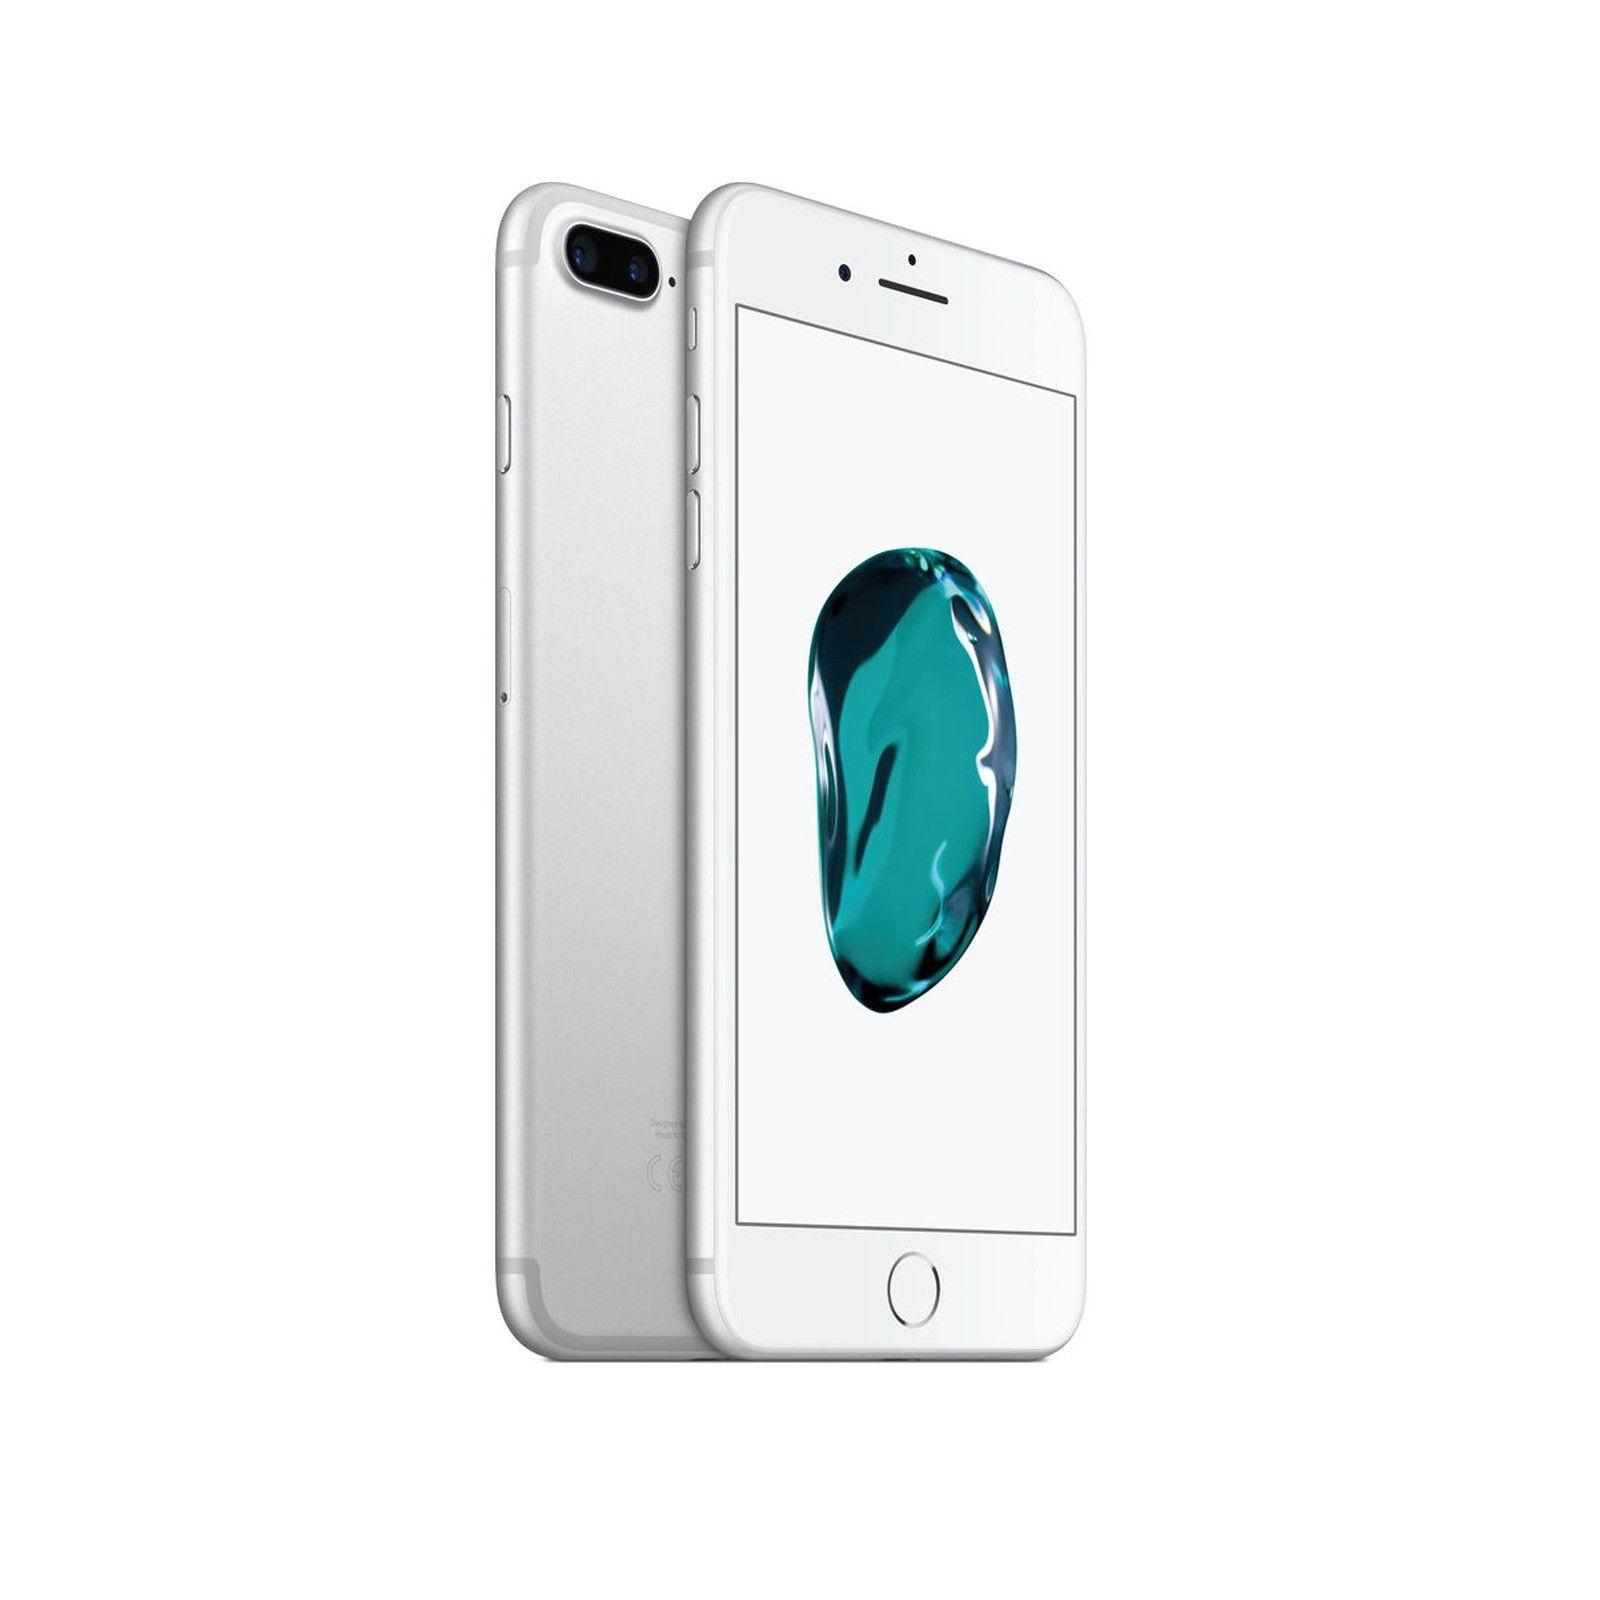 Buy Apple Iphone 7 Plus 32 Gb Online In Siliguri Gangtok Iphone Price Iphone 7 Plus Iphone